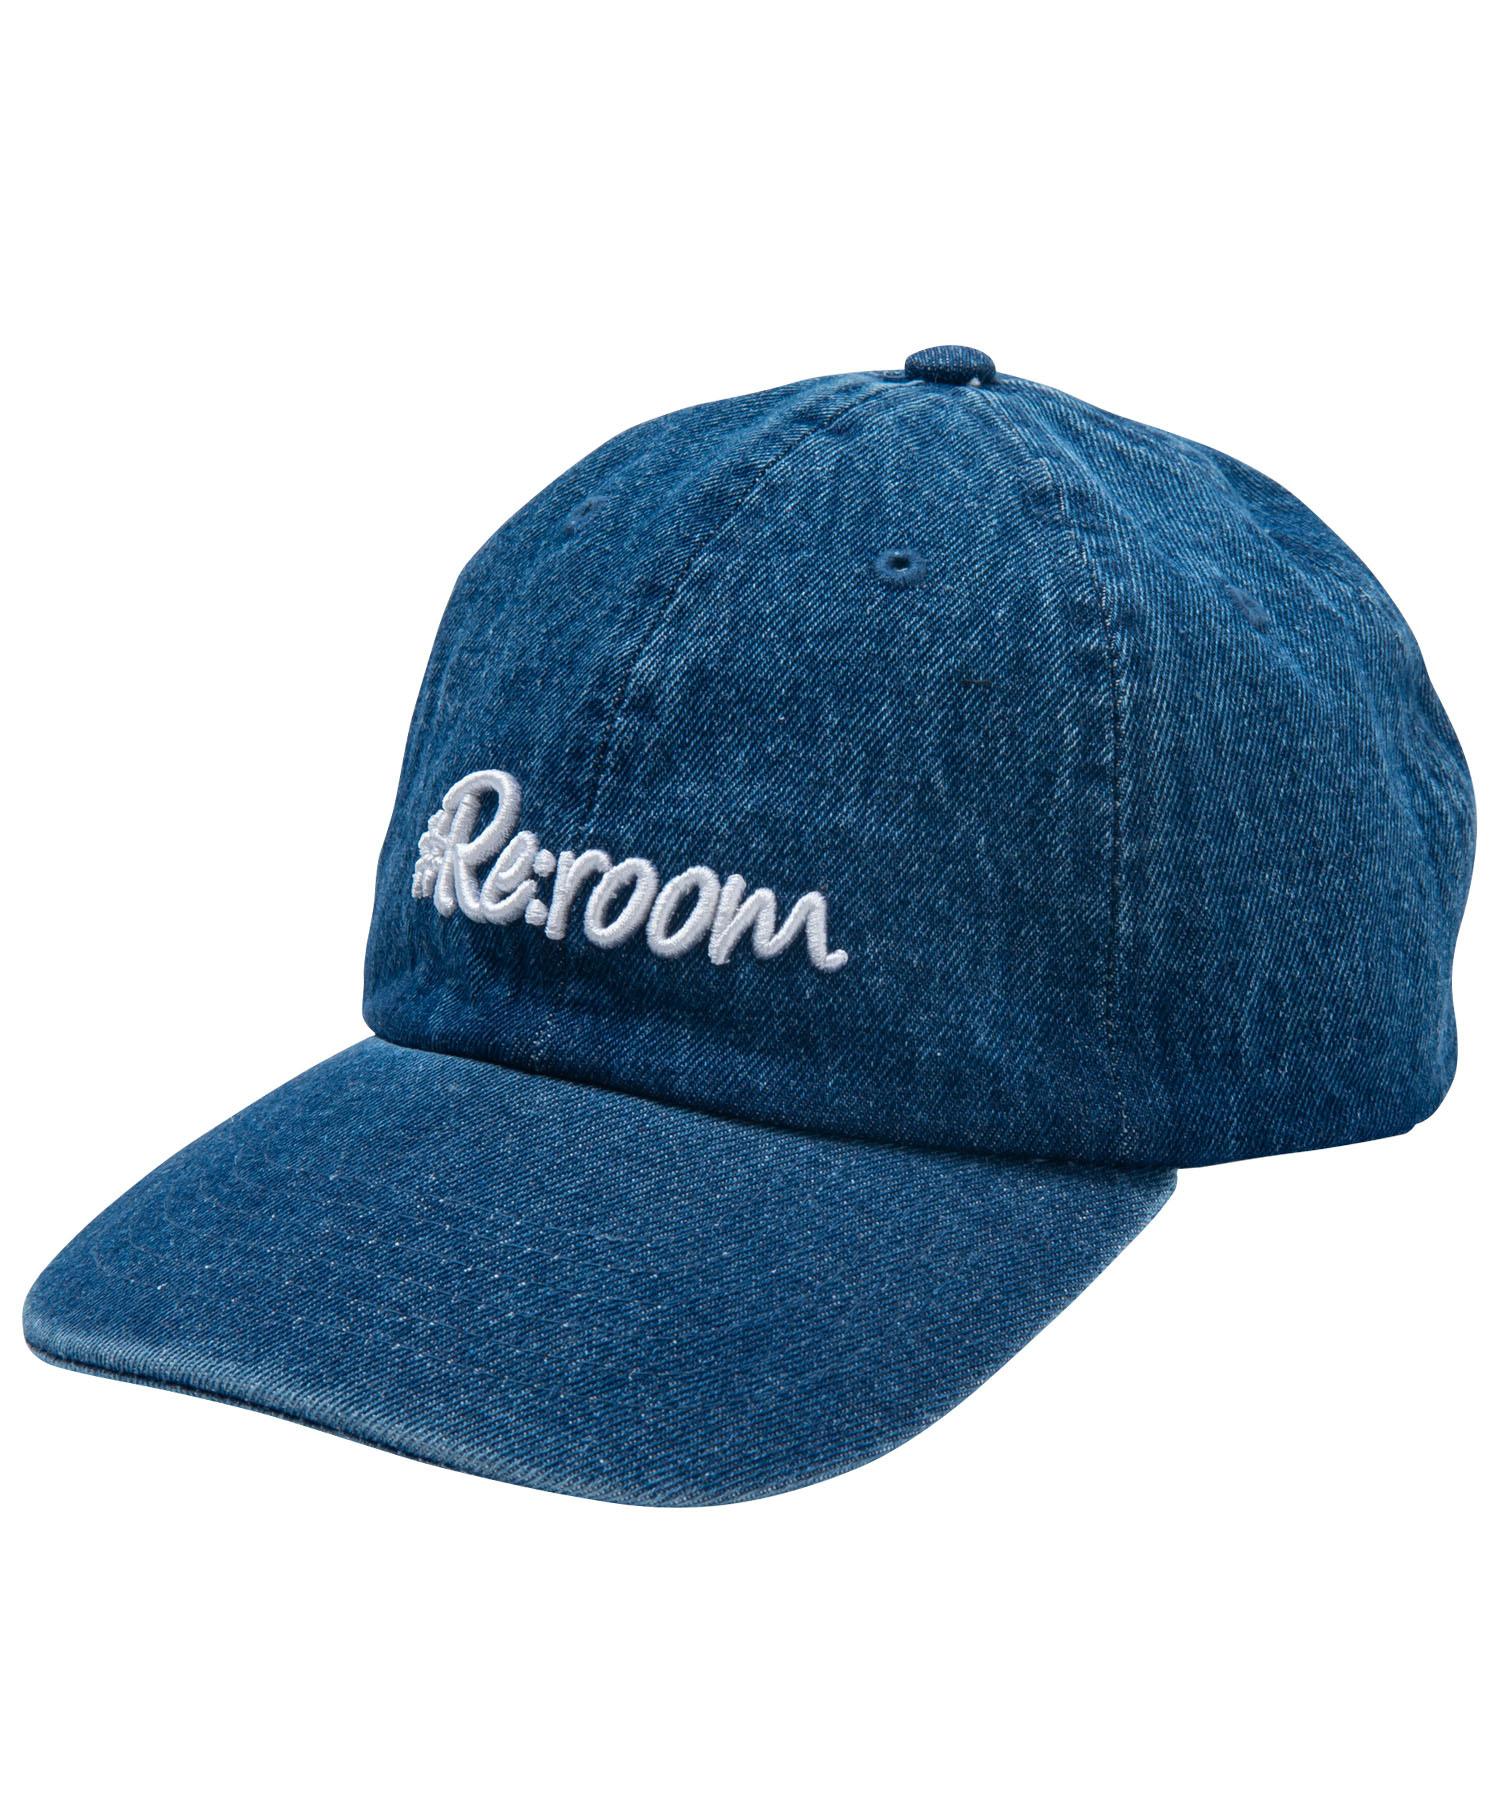 3D LOGO DENIM CAP[REH081]